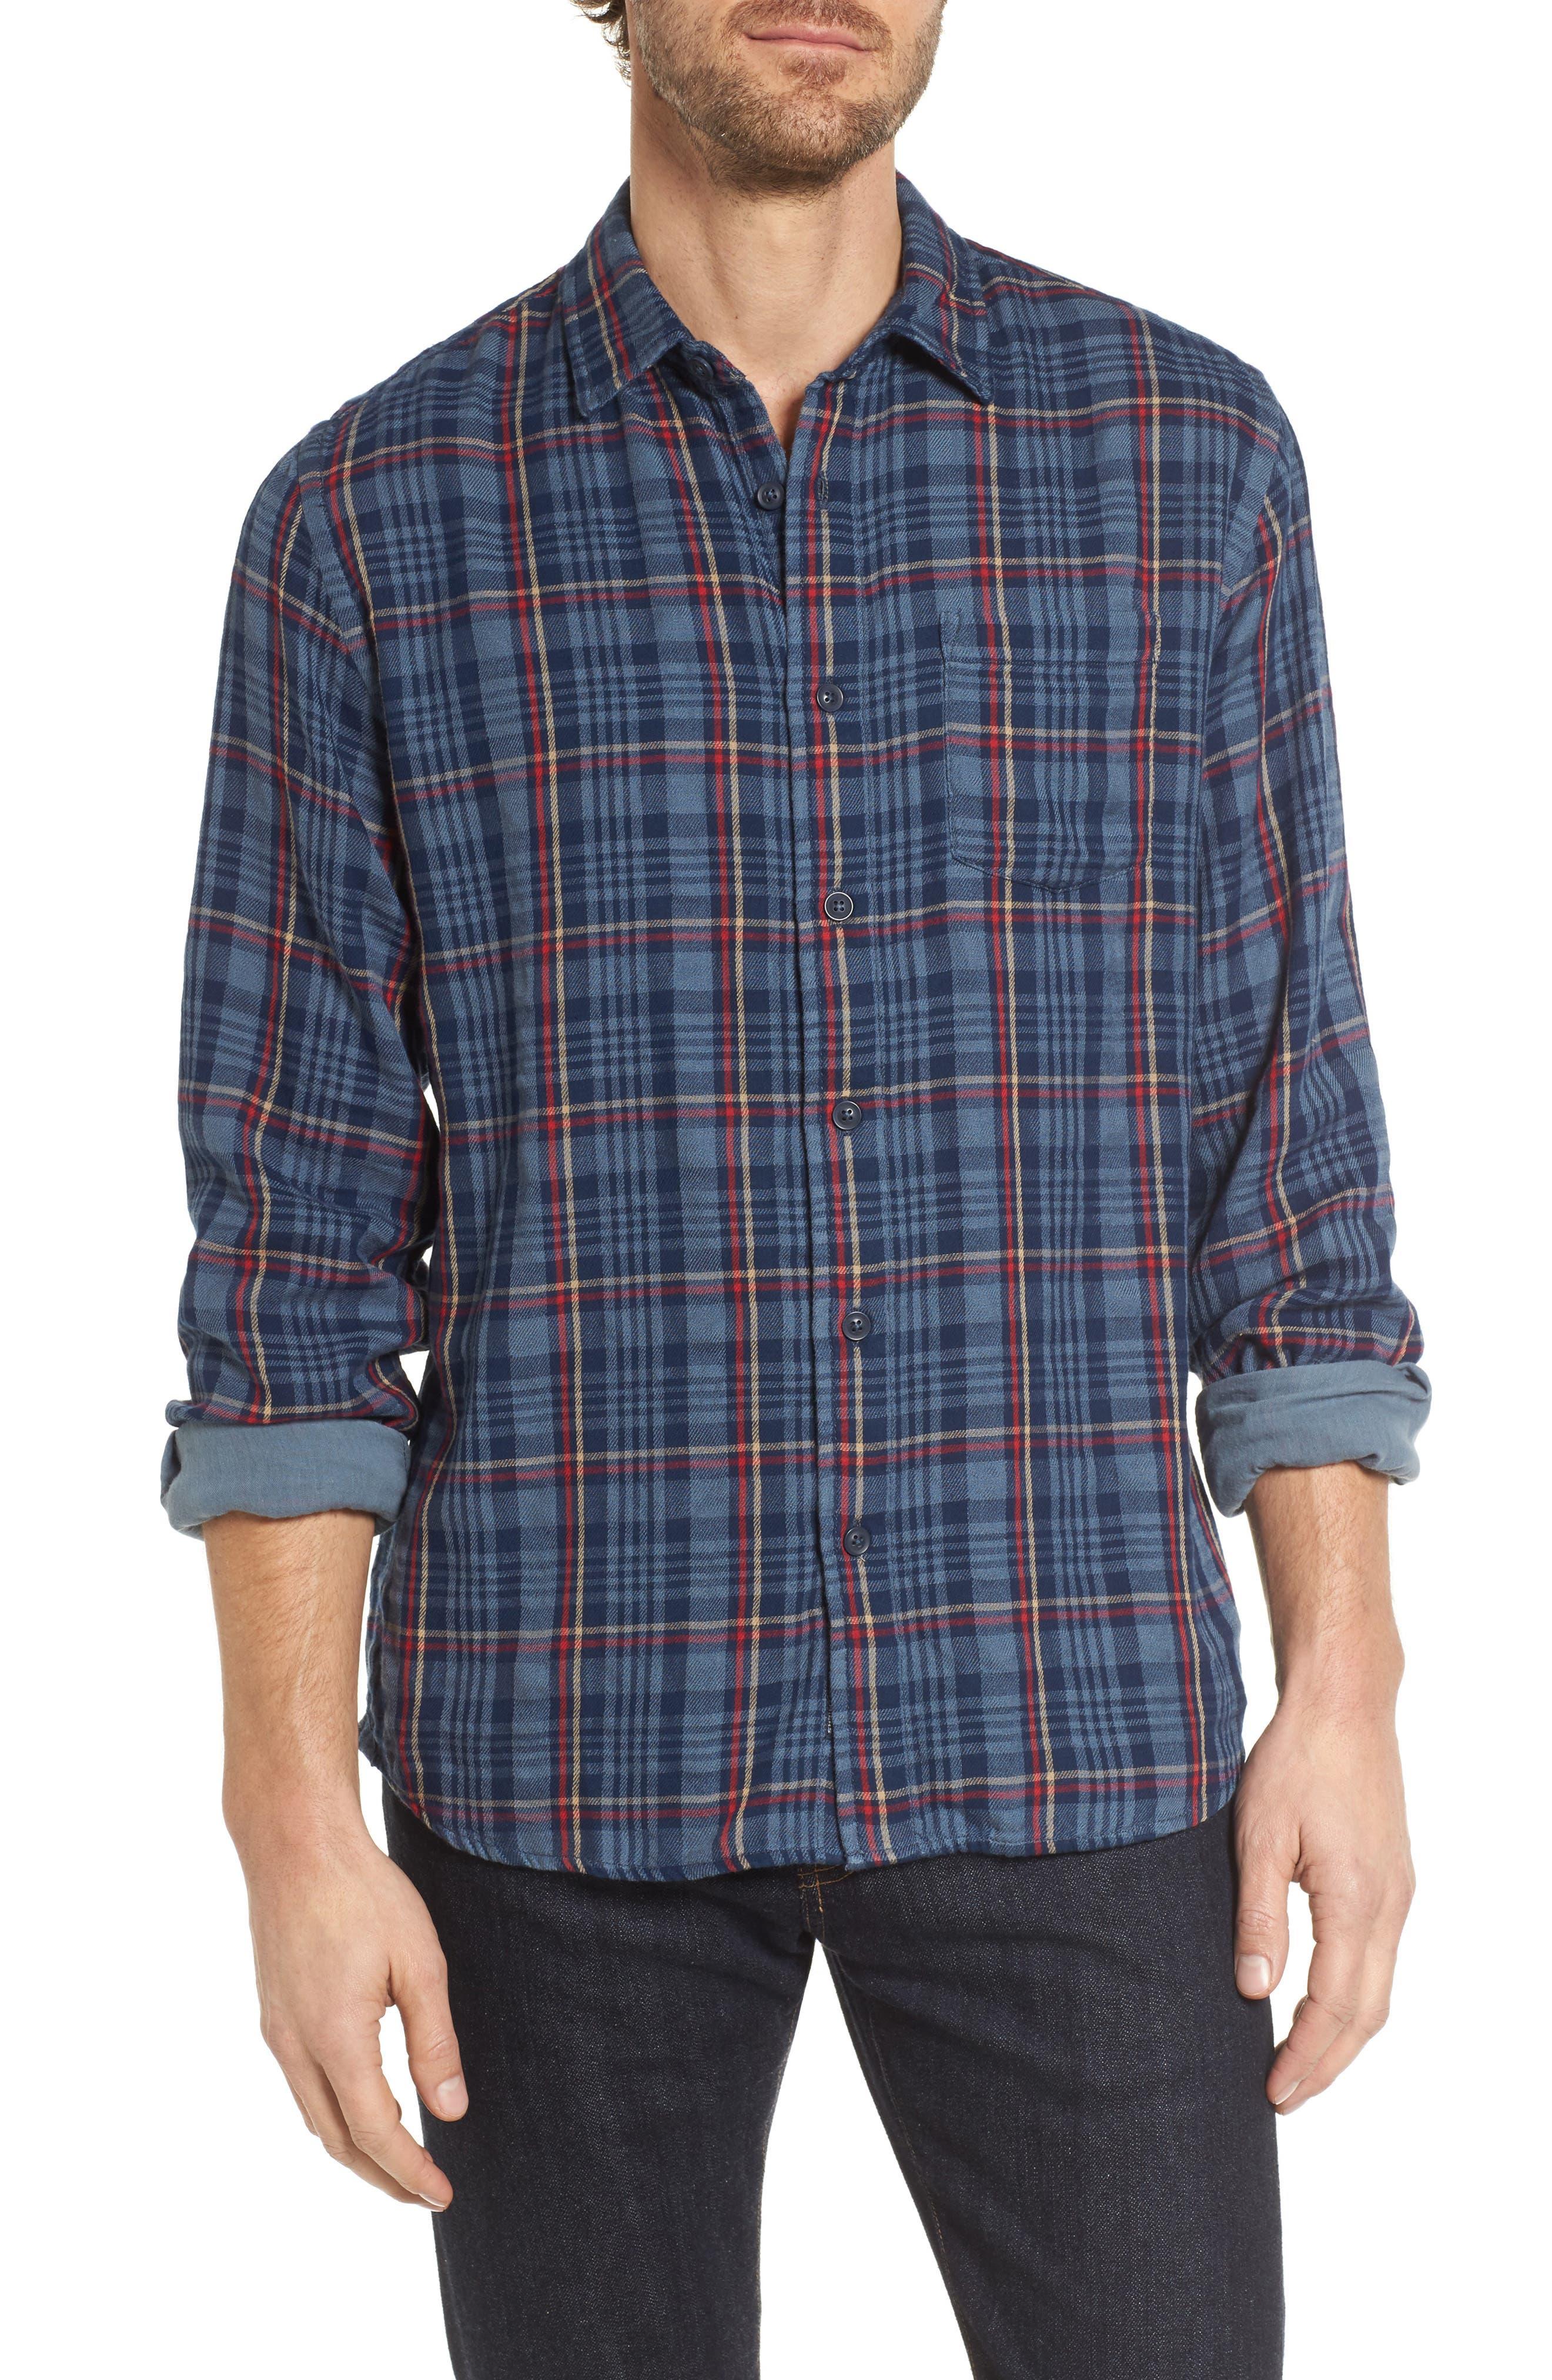 Alton Double Cloth Plaid Sport Shirt,                             Main thumbnail 1, color,                             Navy Grey Plaid